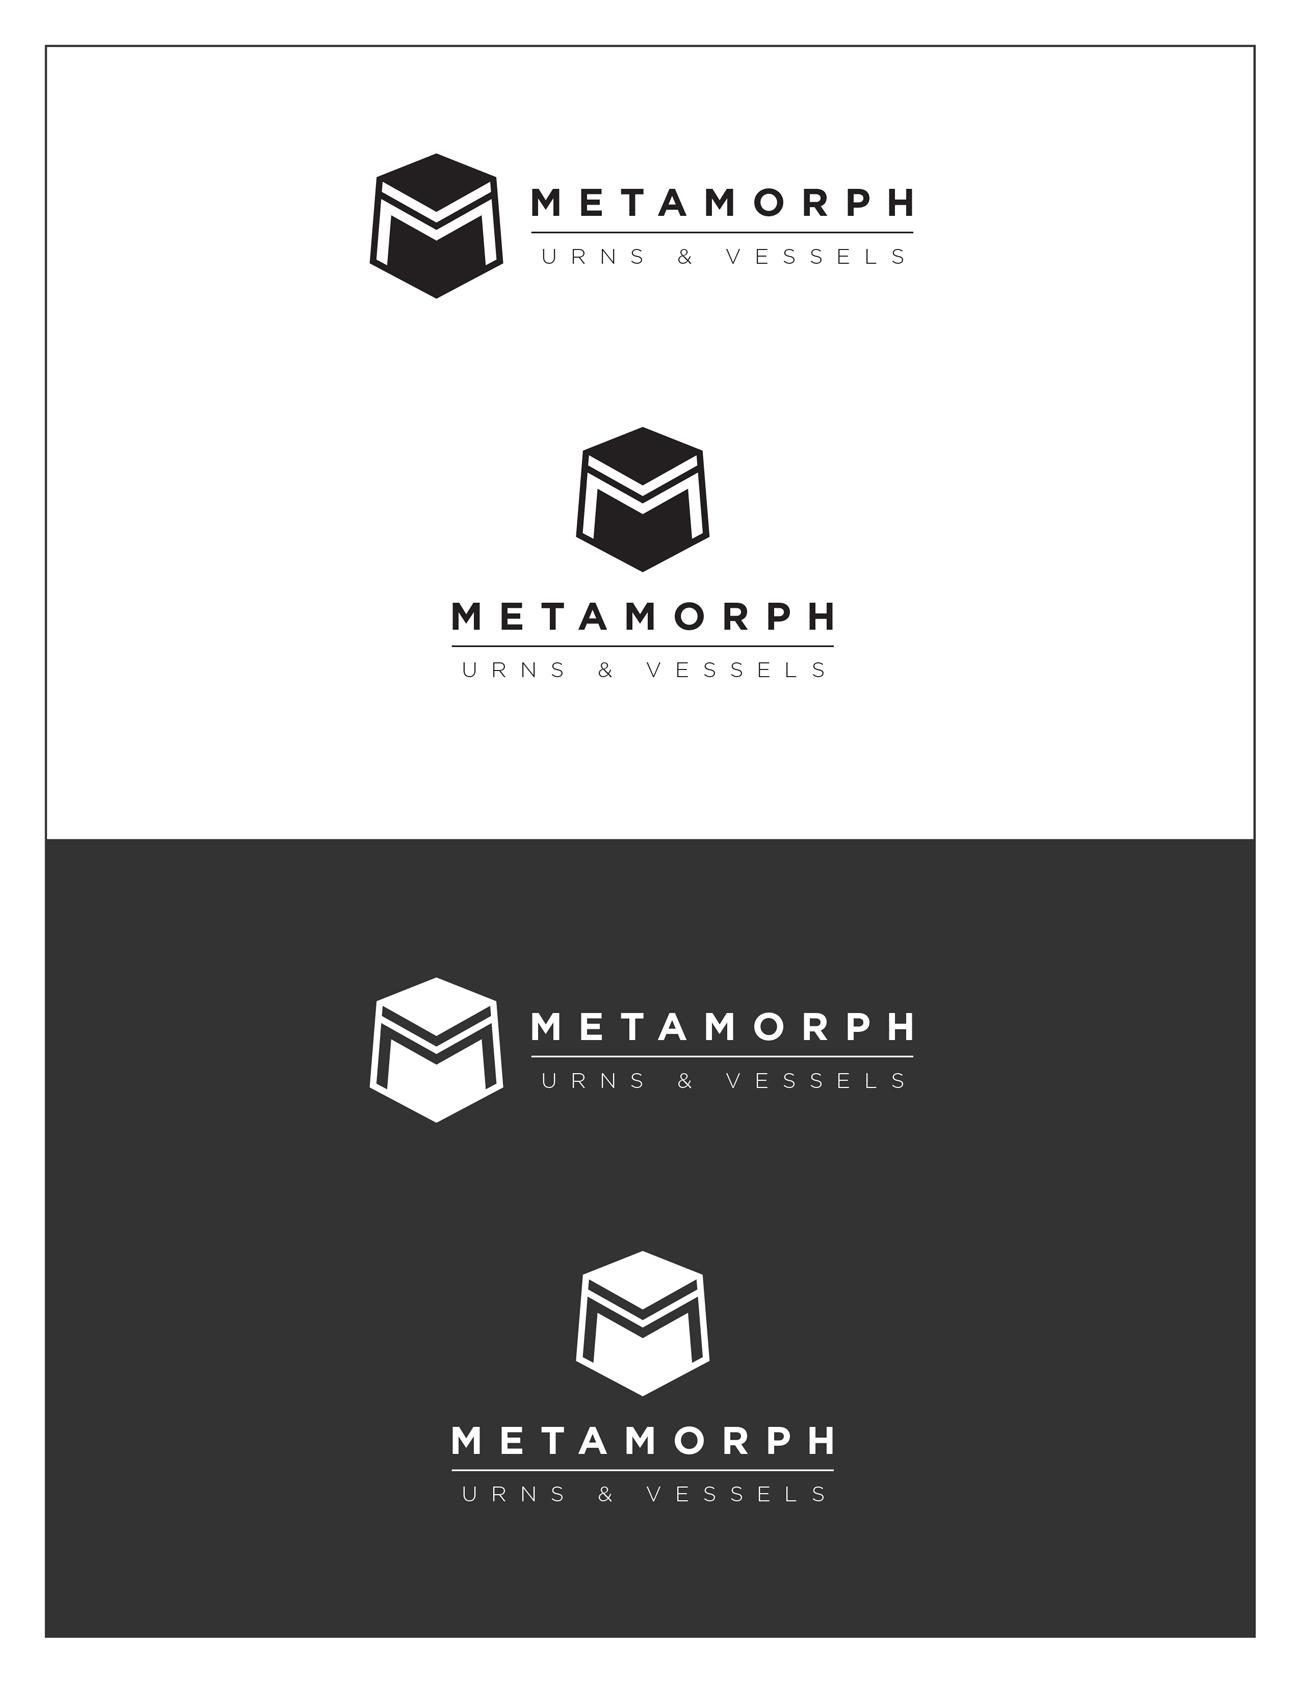 new_logos_004-01